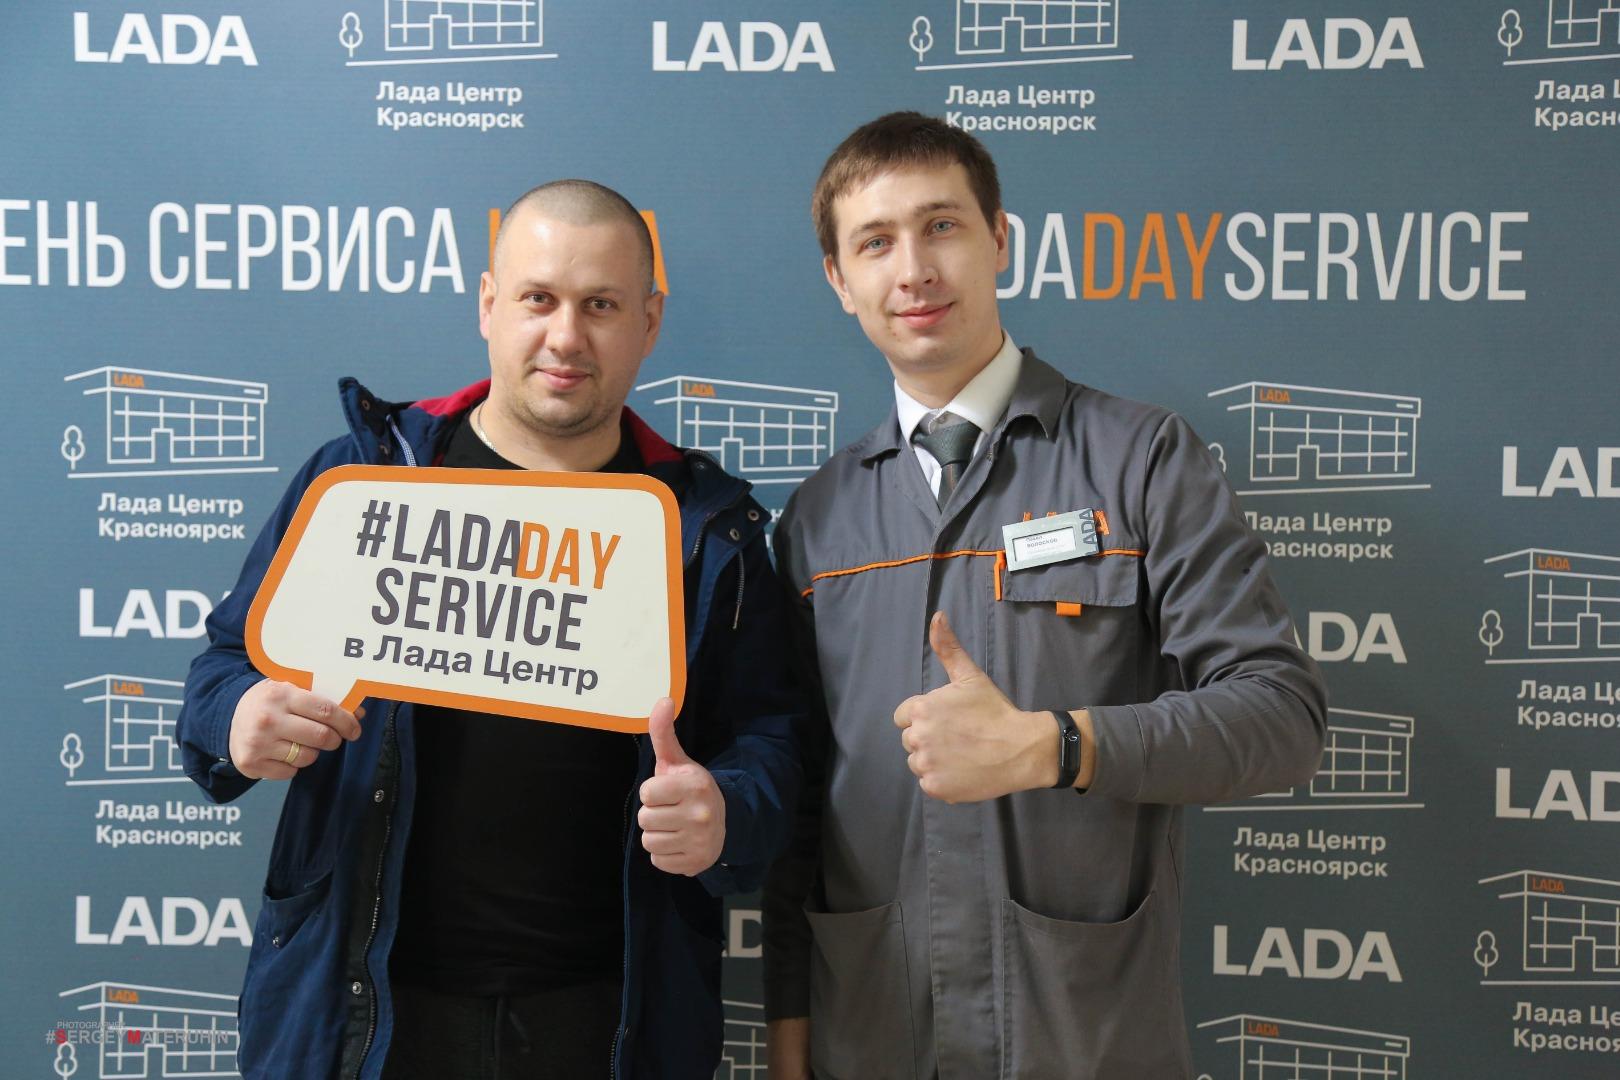 LADA Day Service в Лада Центр